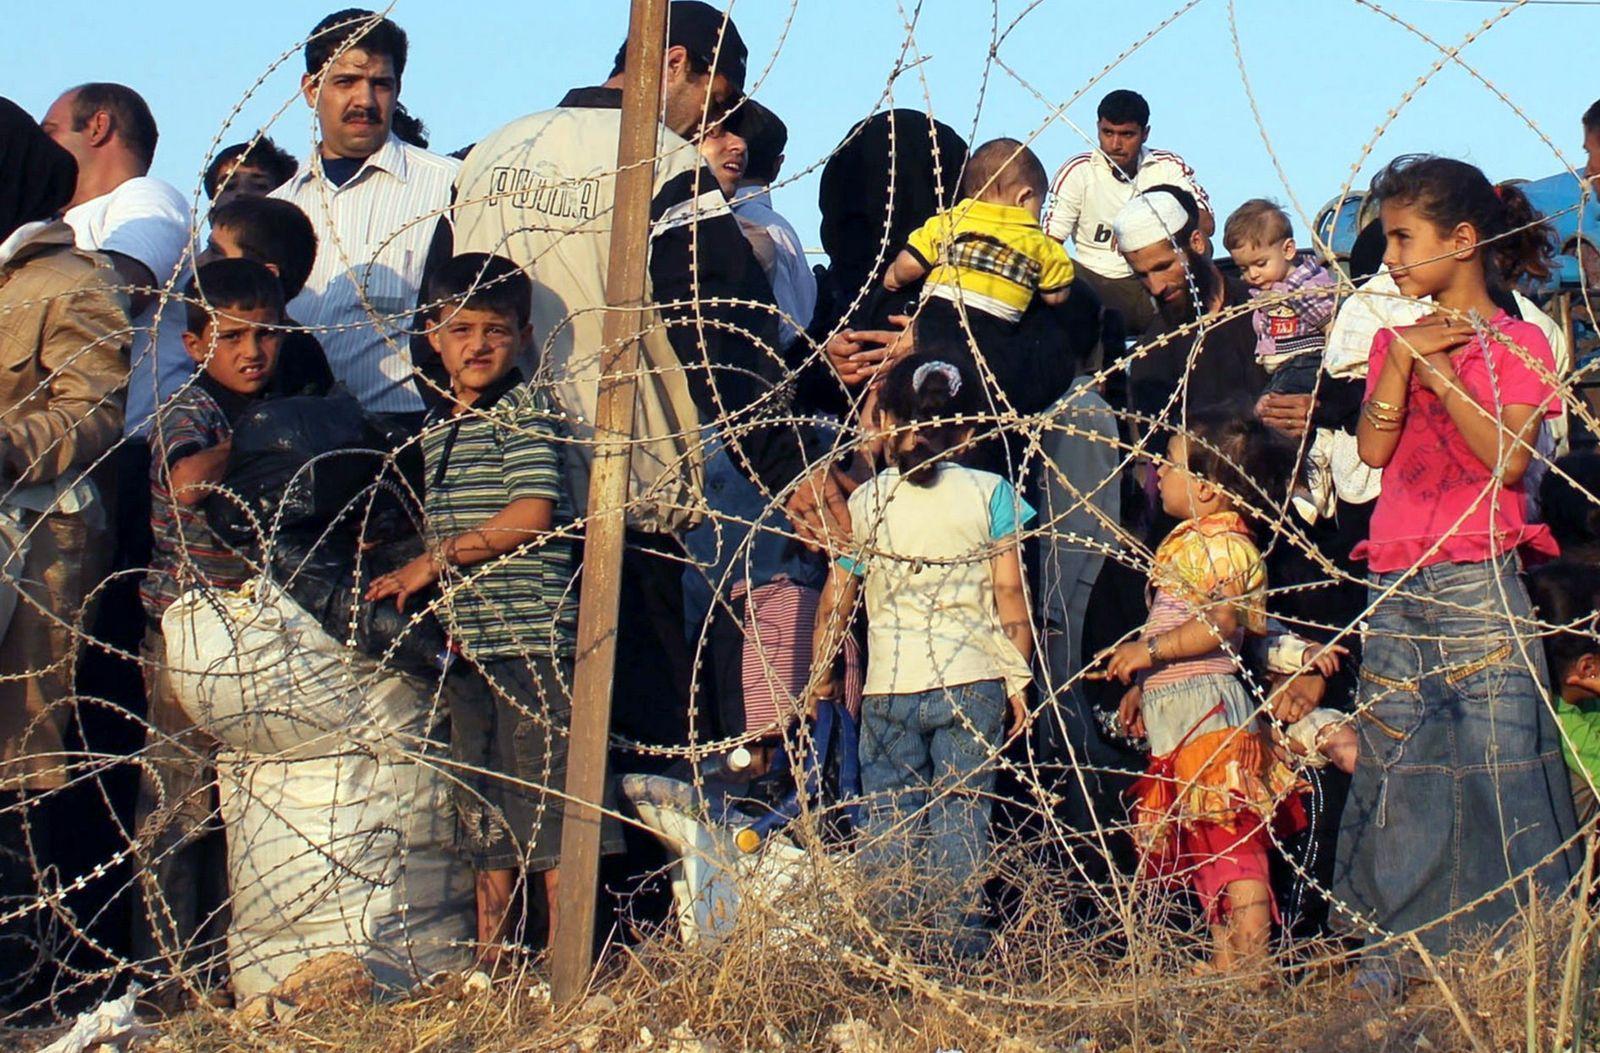 Syrian refugees flee to Turkey